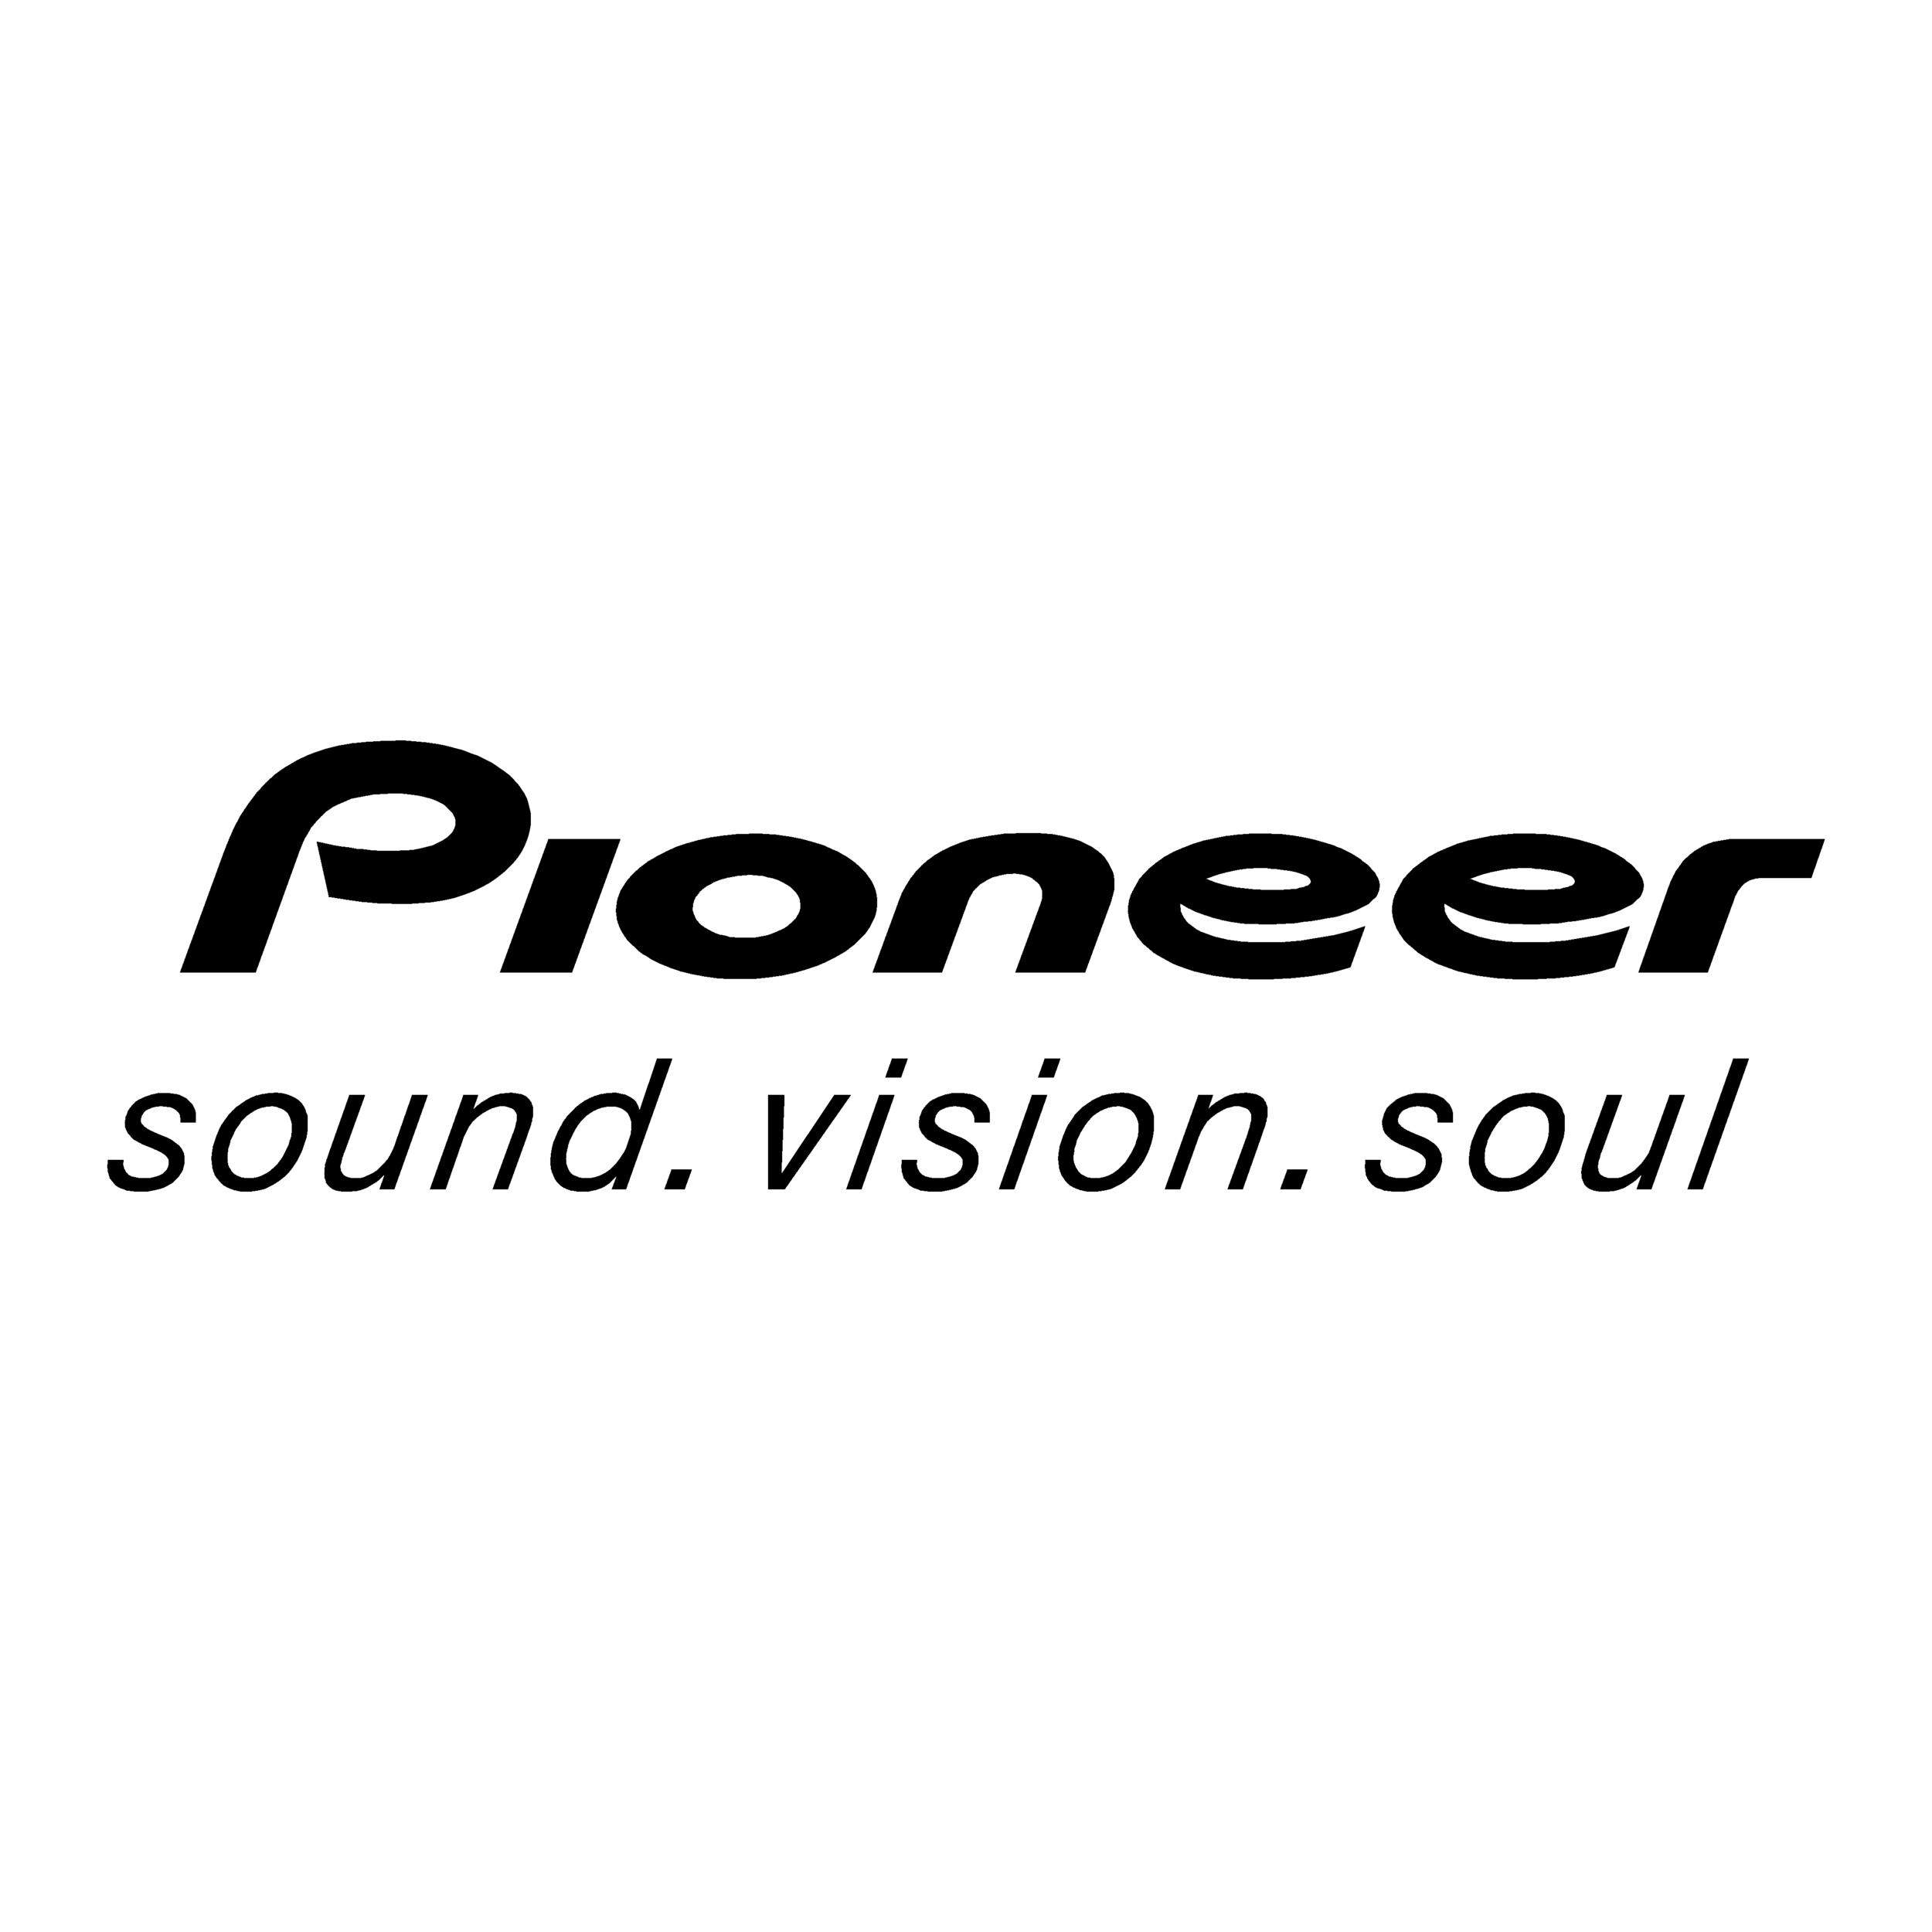 stickers pioneer ref 2 tuning audio sonorisation car auto moto camion competition deco rallye autocollant